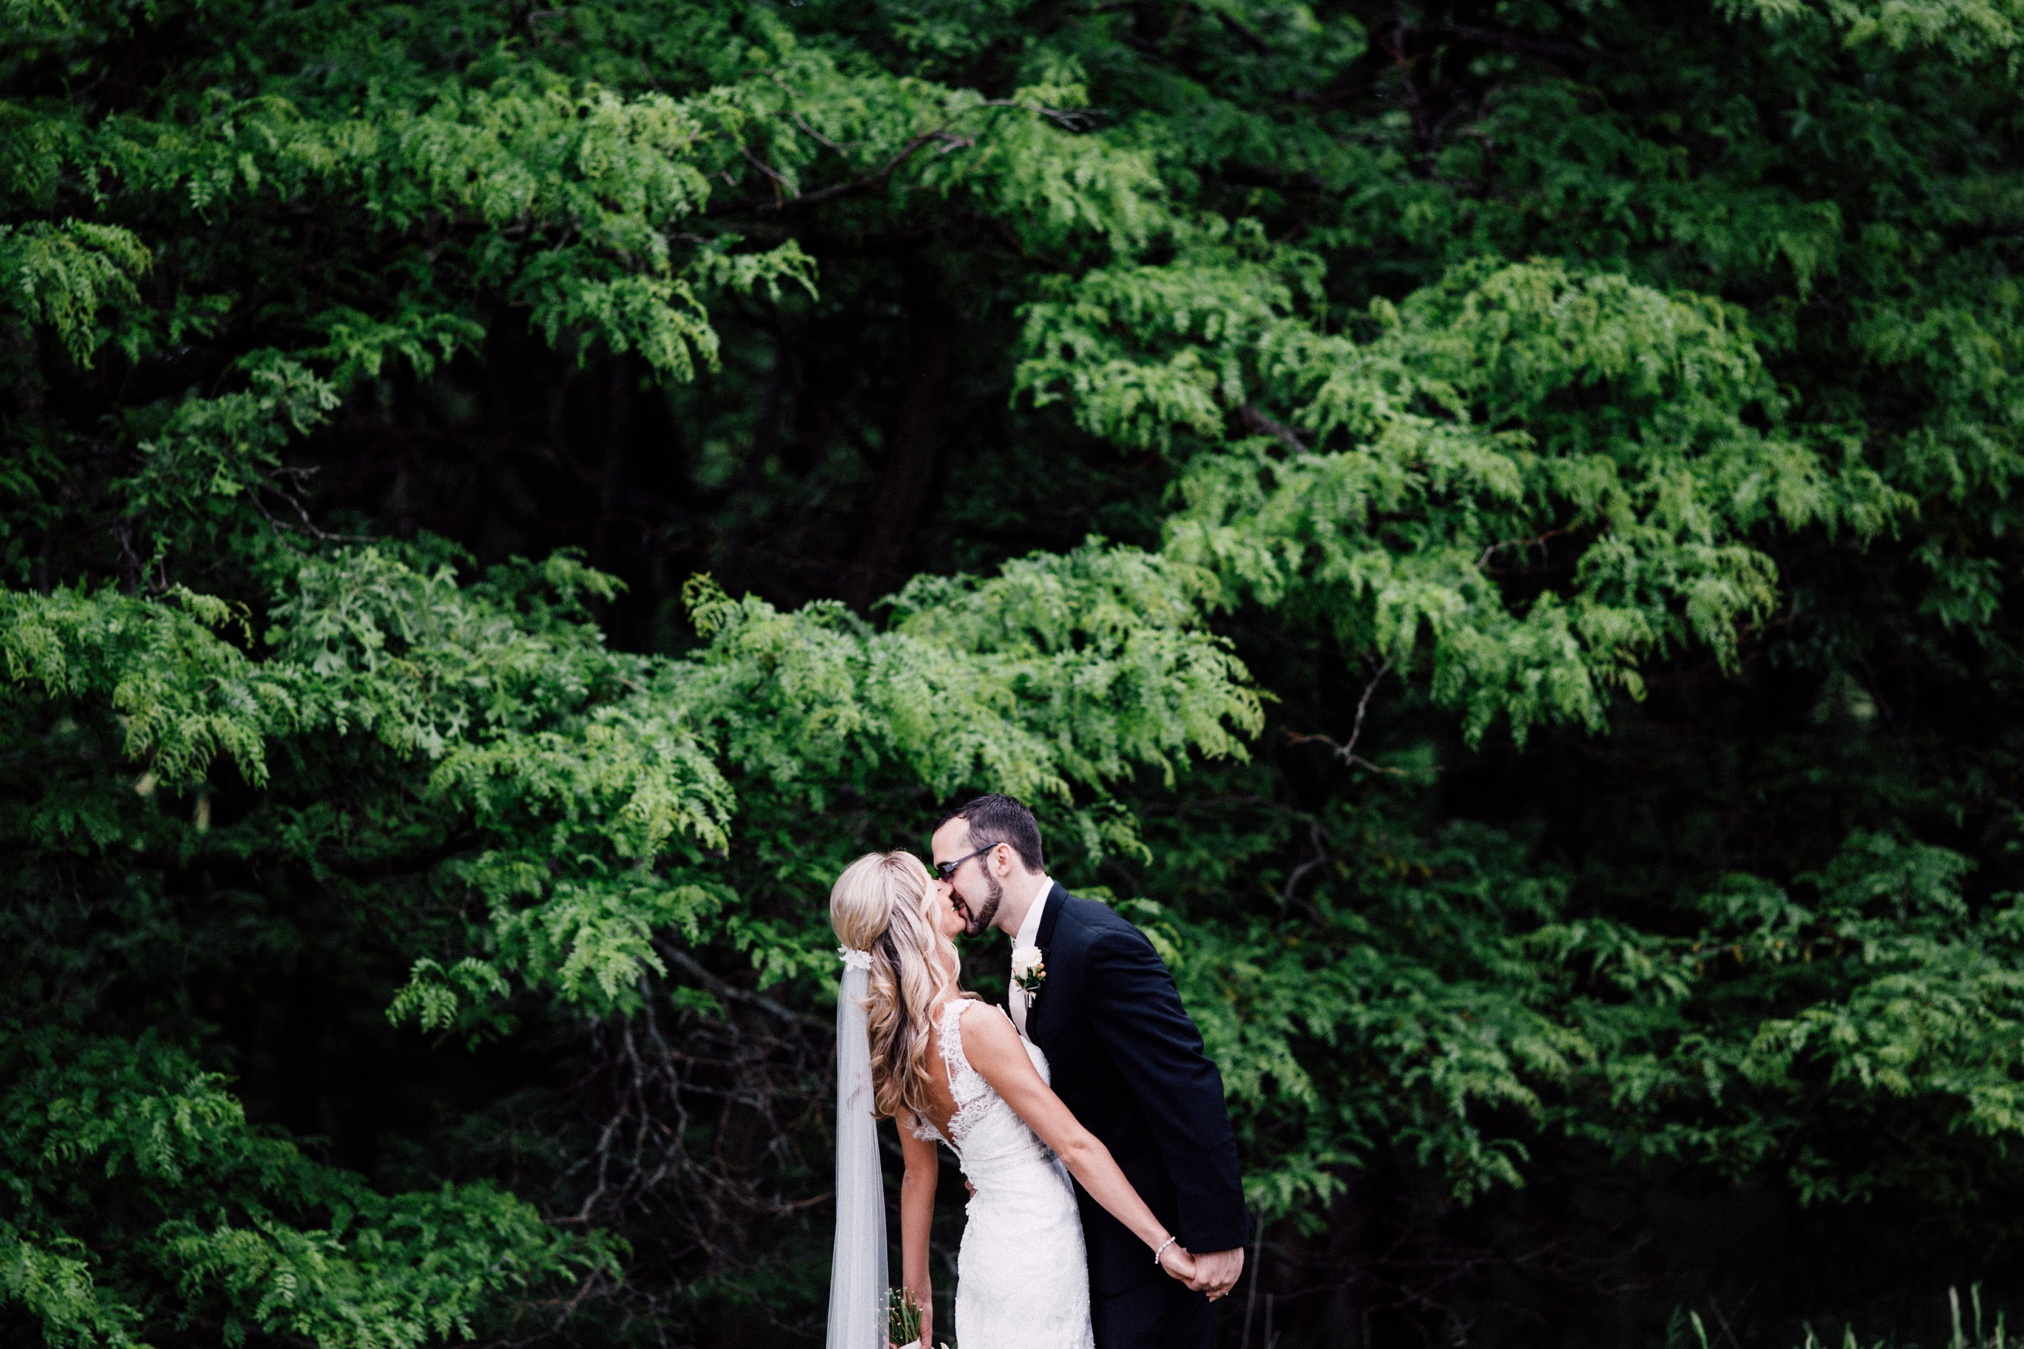 schmid_wedding-654.jpg